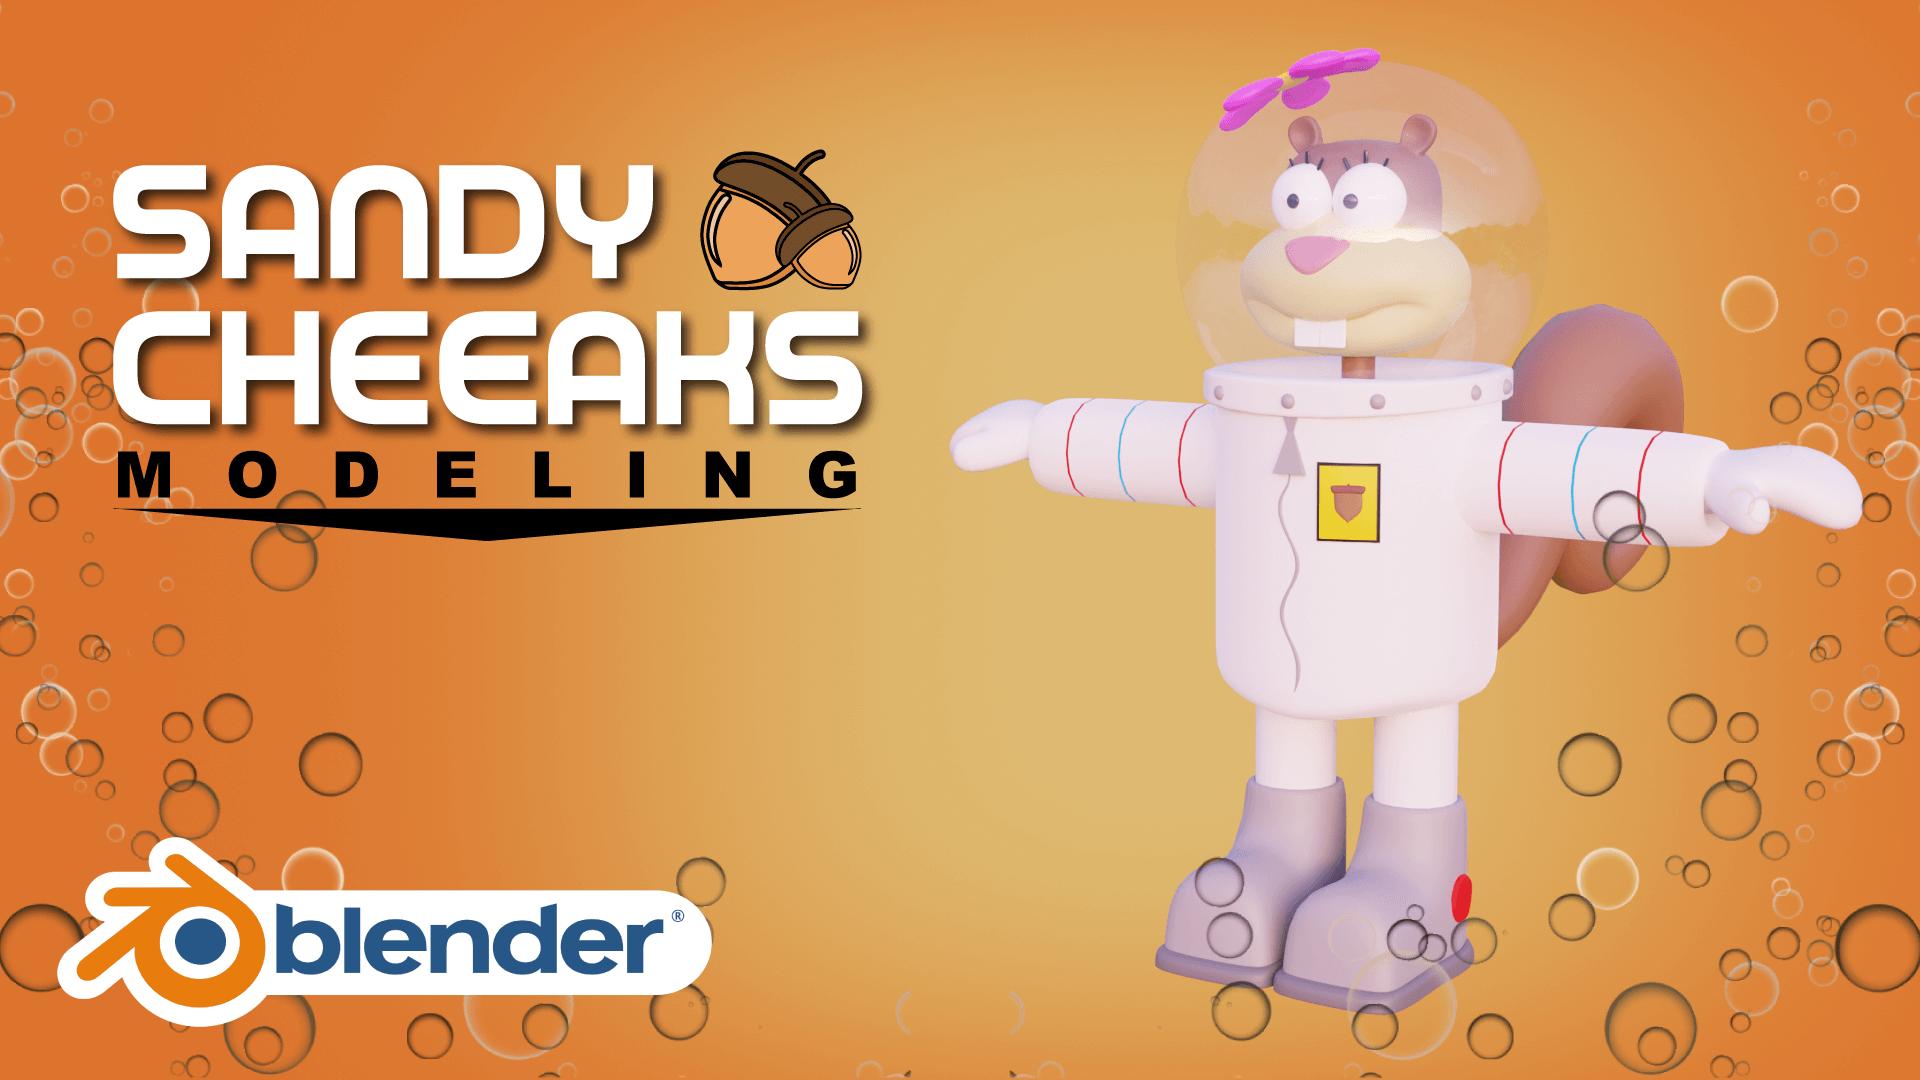 Sandy Cheeaks Sponge Bob Square Pants 3D Model Blender Academy Course